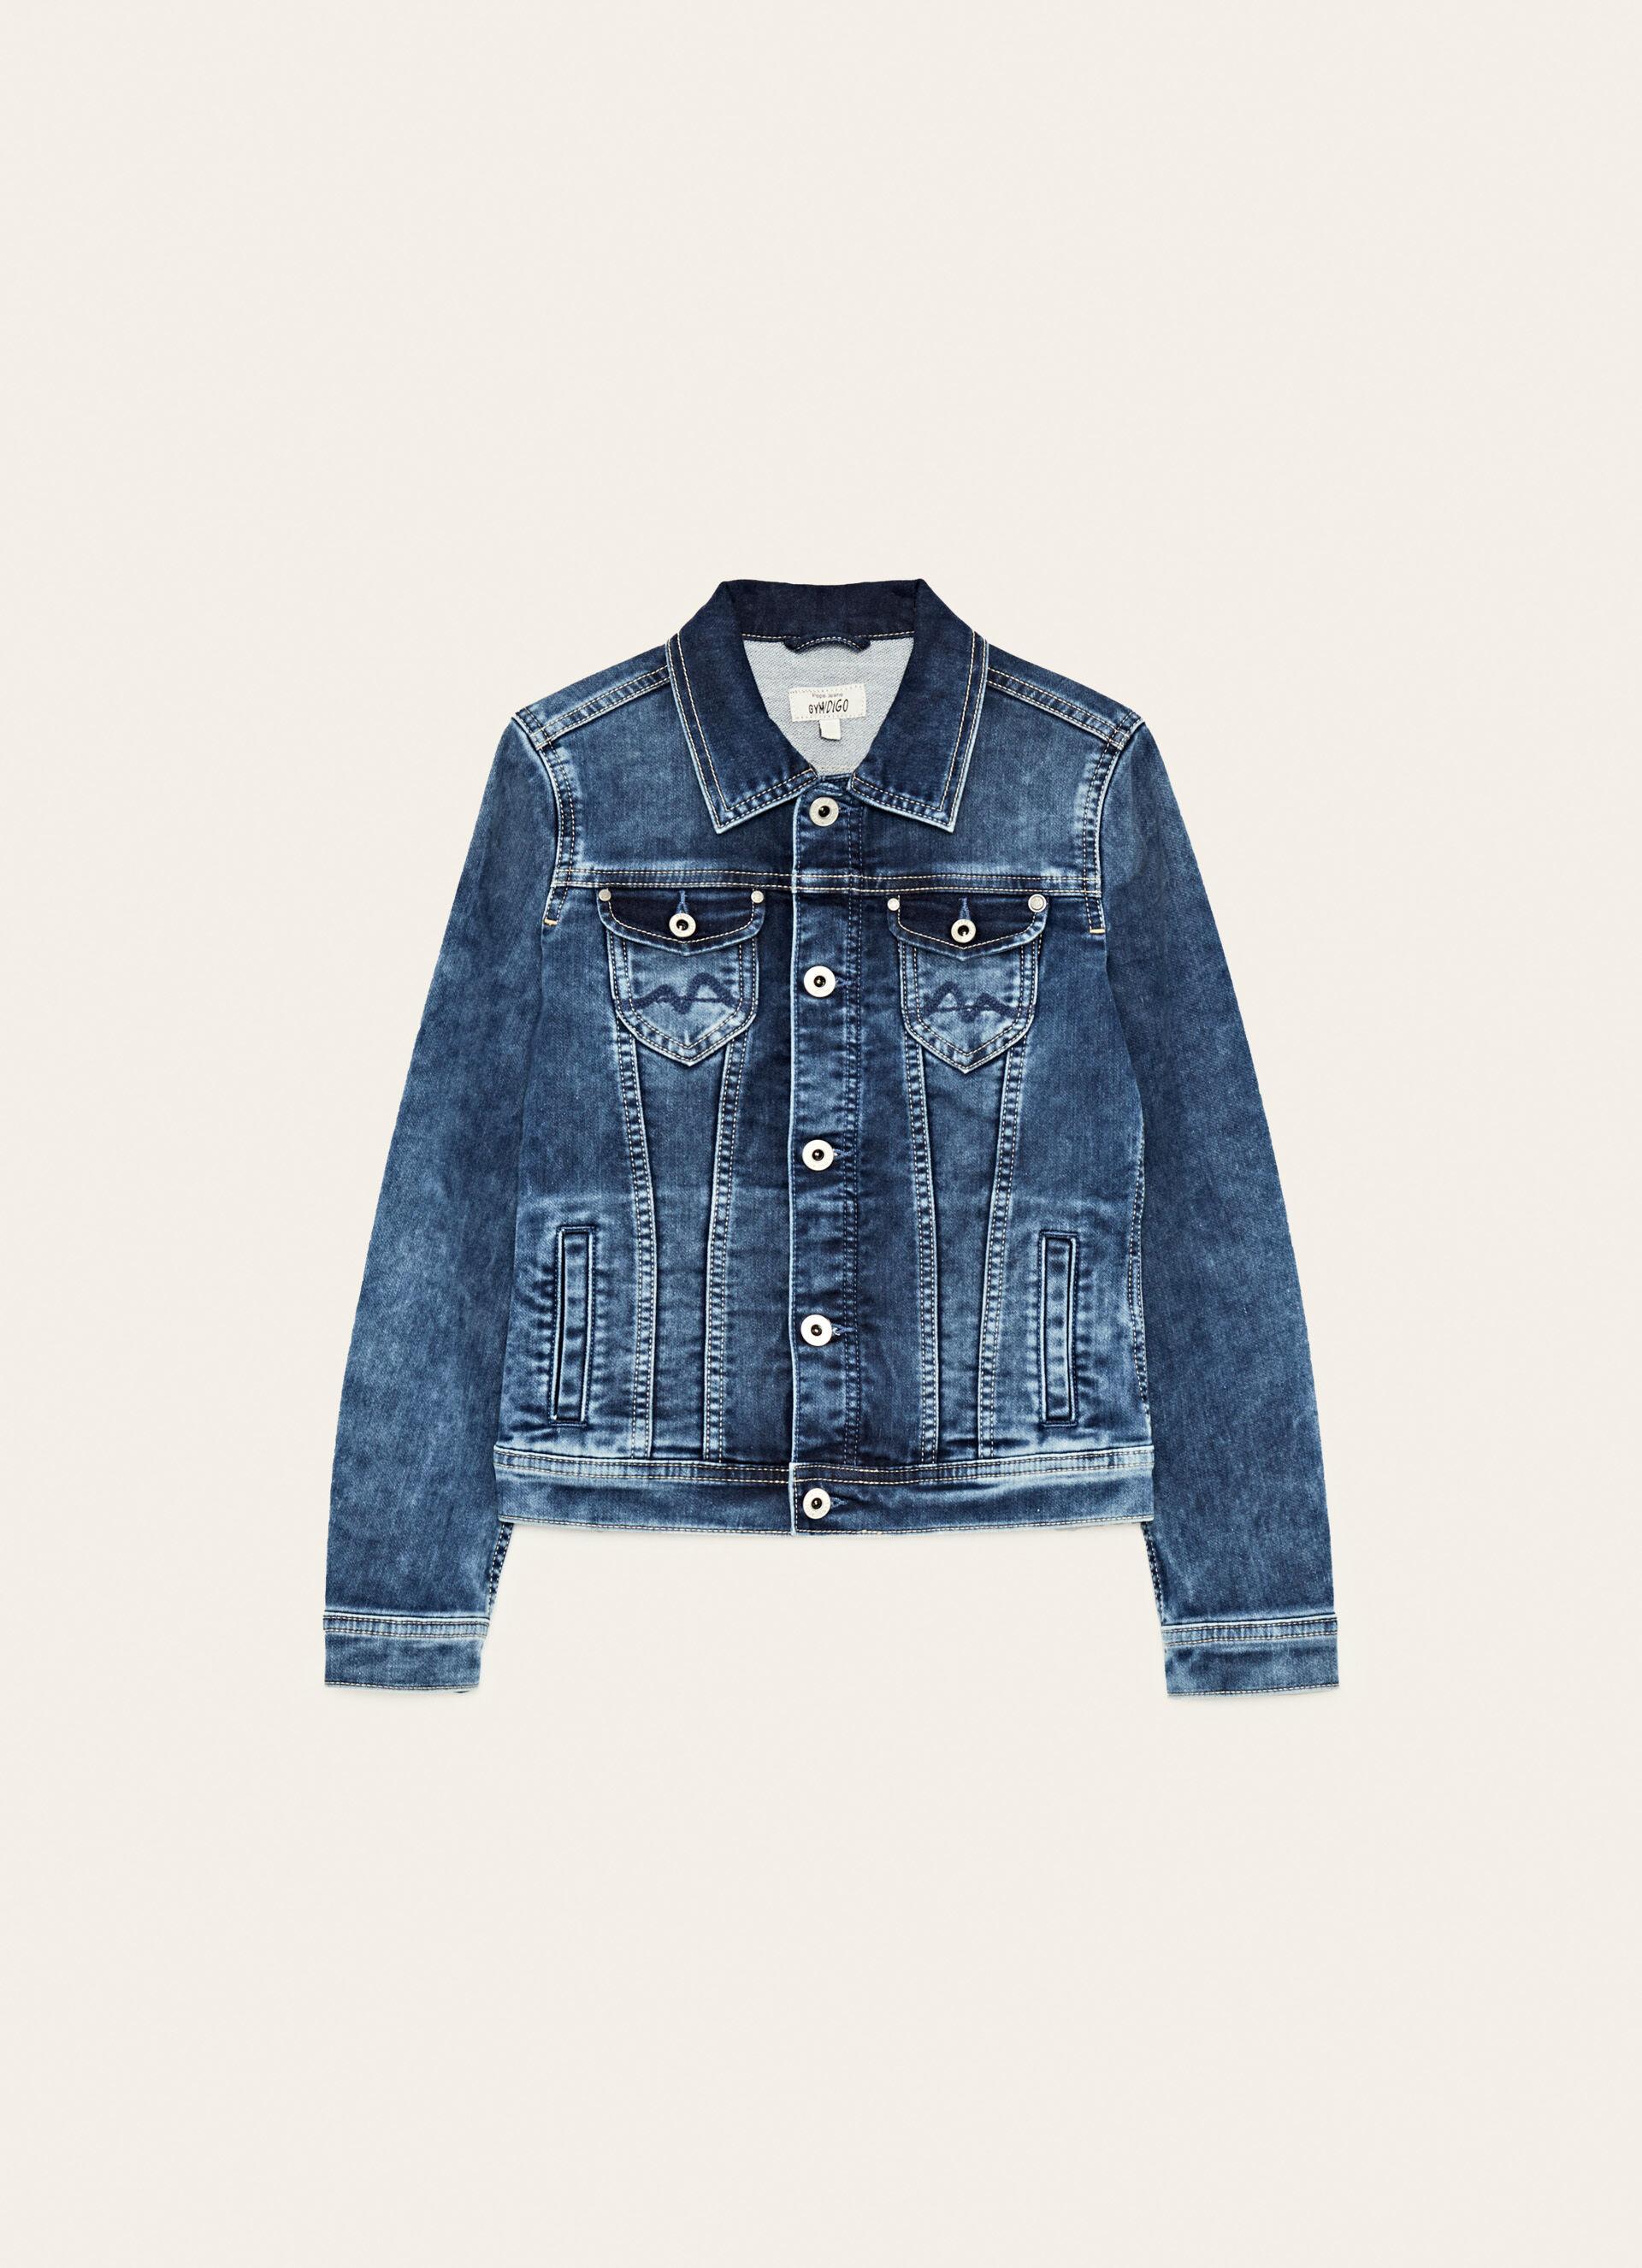 pepe jeans jacke new berry, Pepe Jeans Damen Röcke SUE